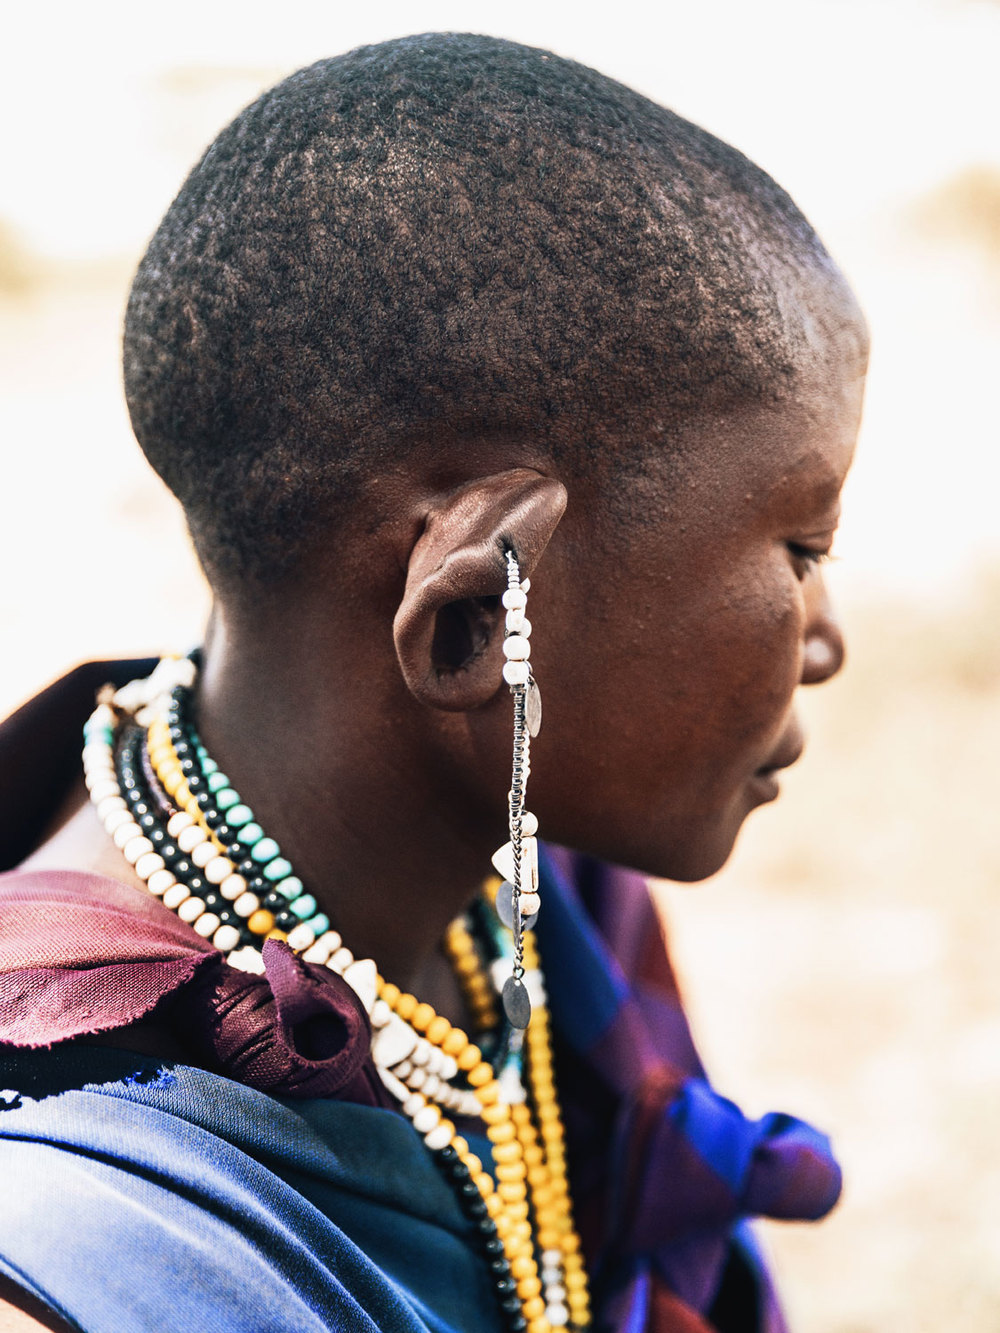 CallieGiovanna_Africa_Tanzania_MalangaVillage_20150101_07508.jpg